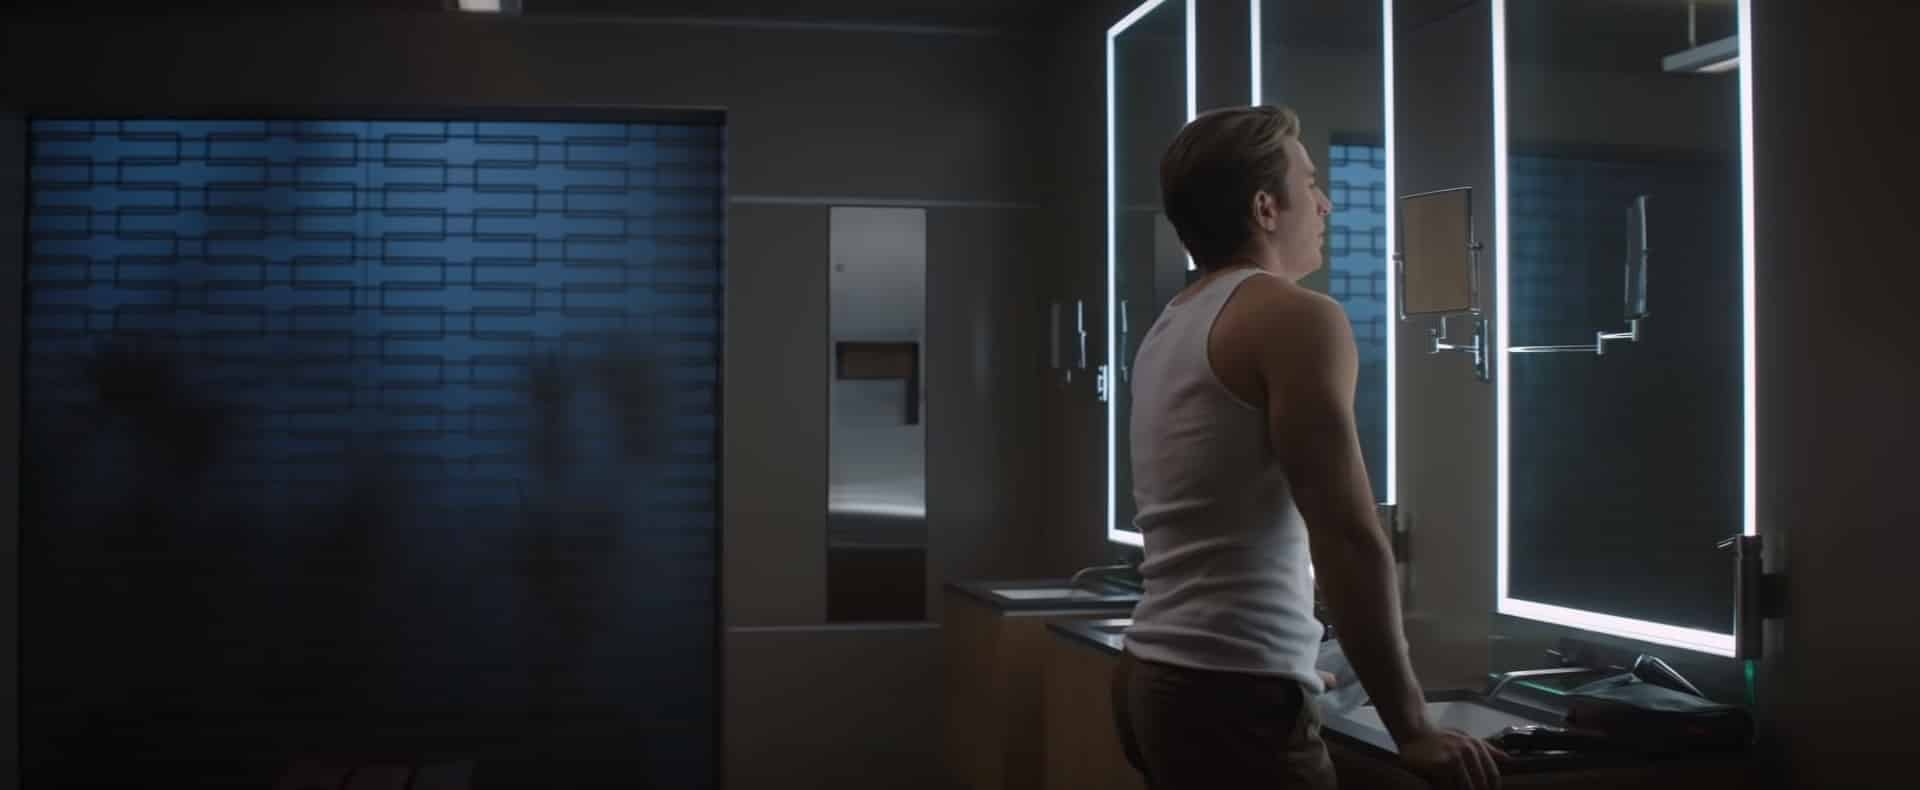 Chris evans Chris evans Capitán América Endgame